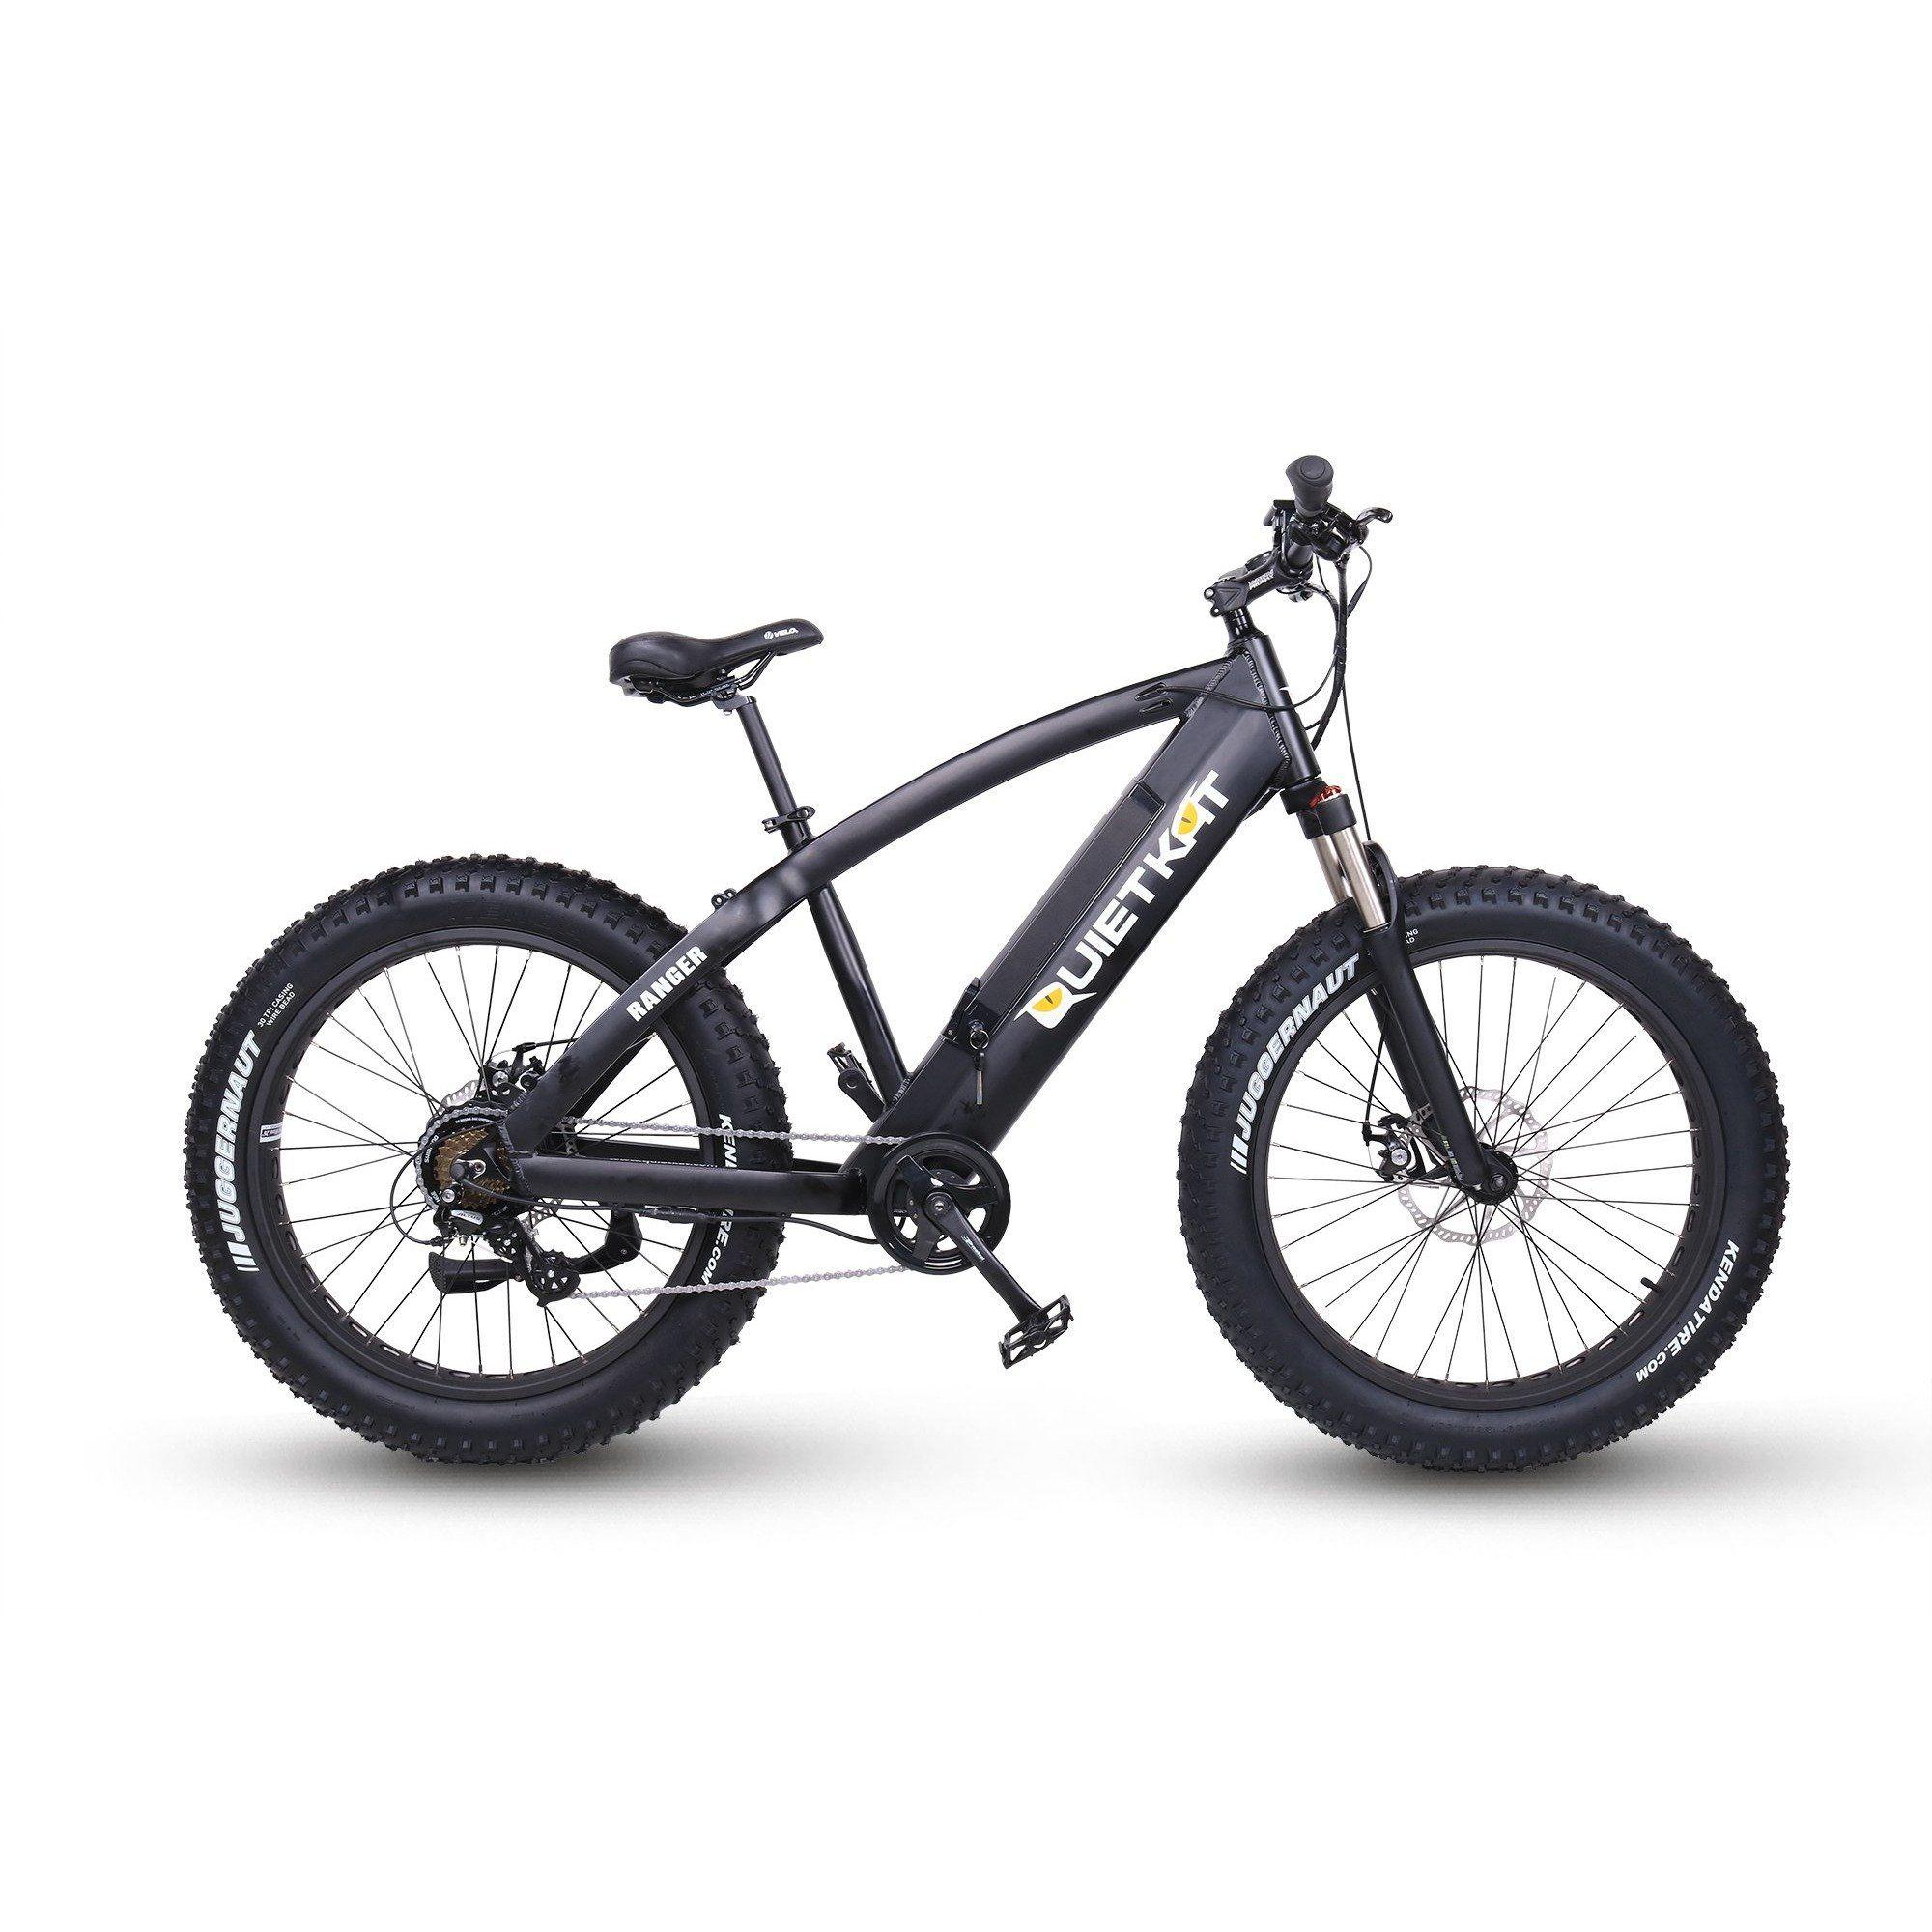 Quietkat Ranger 750 Electric Bicycle Electric Bike Electric Mountain Bike Bike